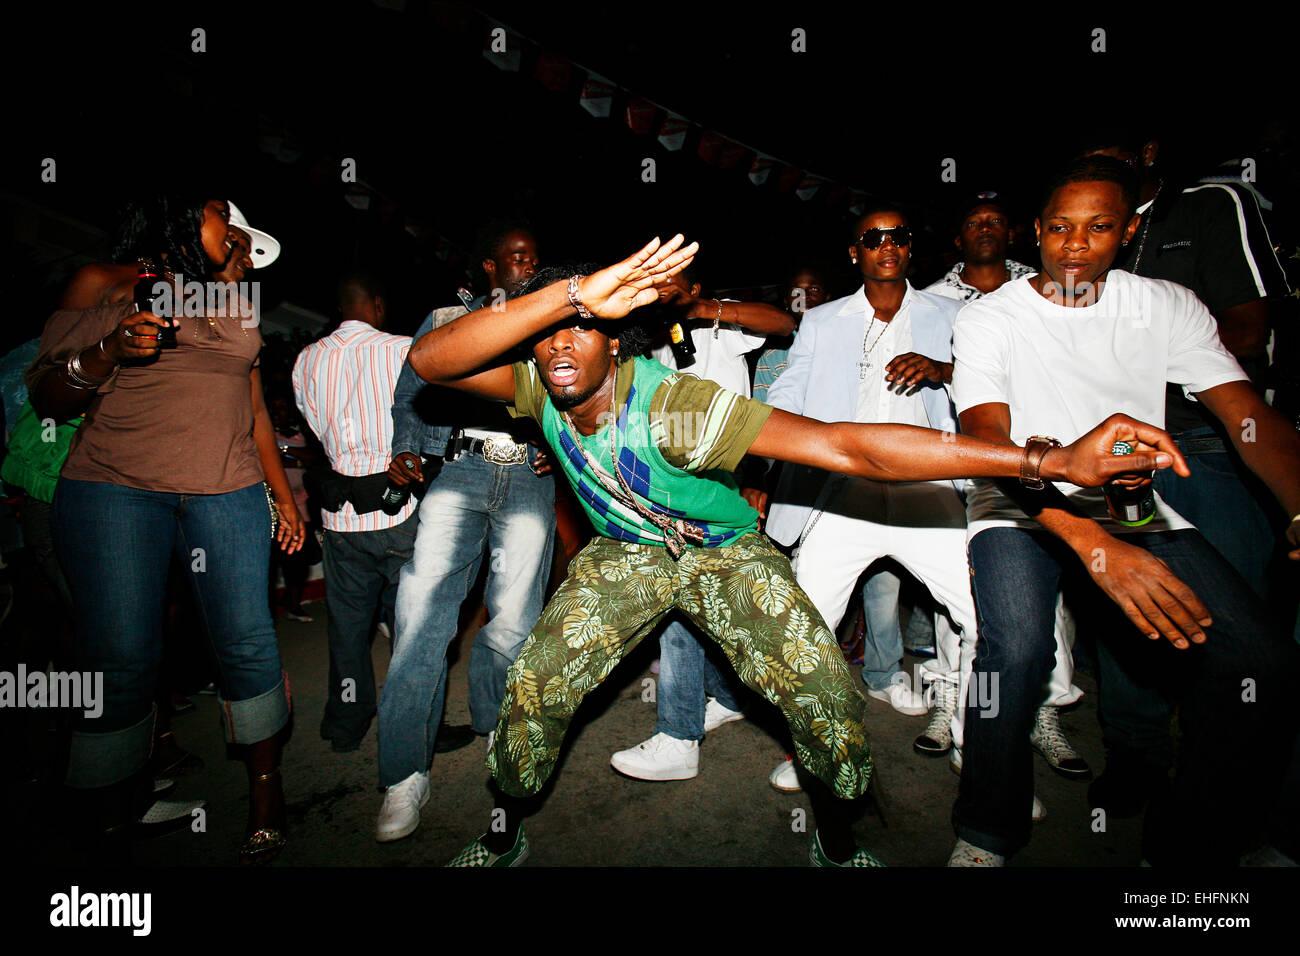 Ding Dong dancing at Gabba Sundays in Nannyville Kingston Jamaica. - Stock Image